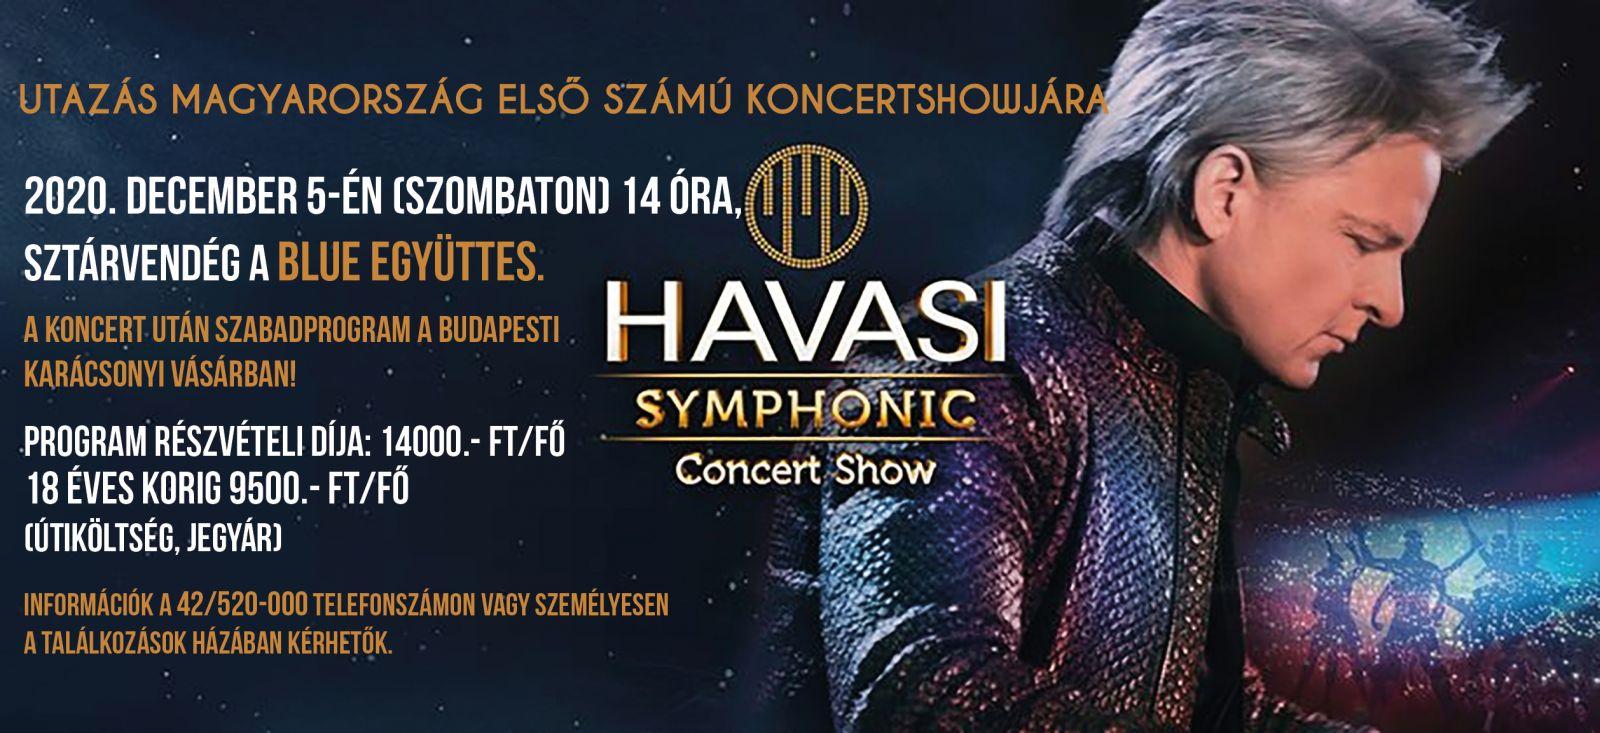 Budapest - Havasi symphonic concert show